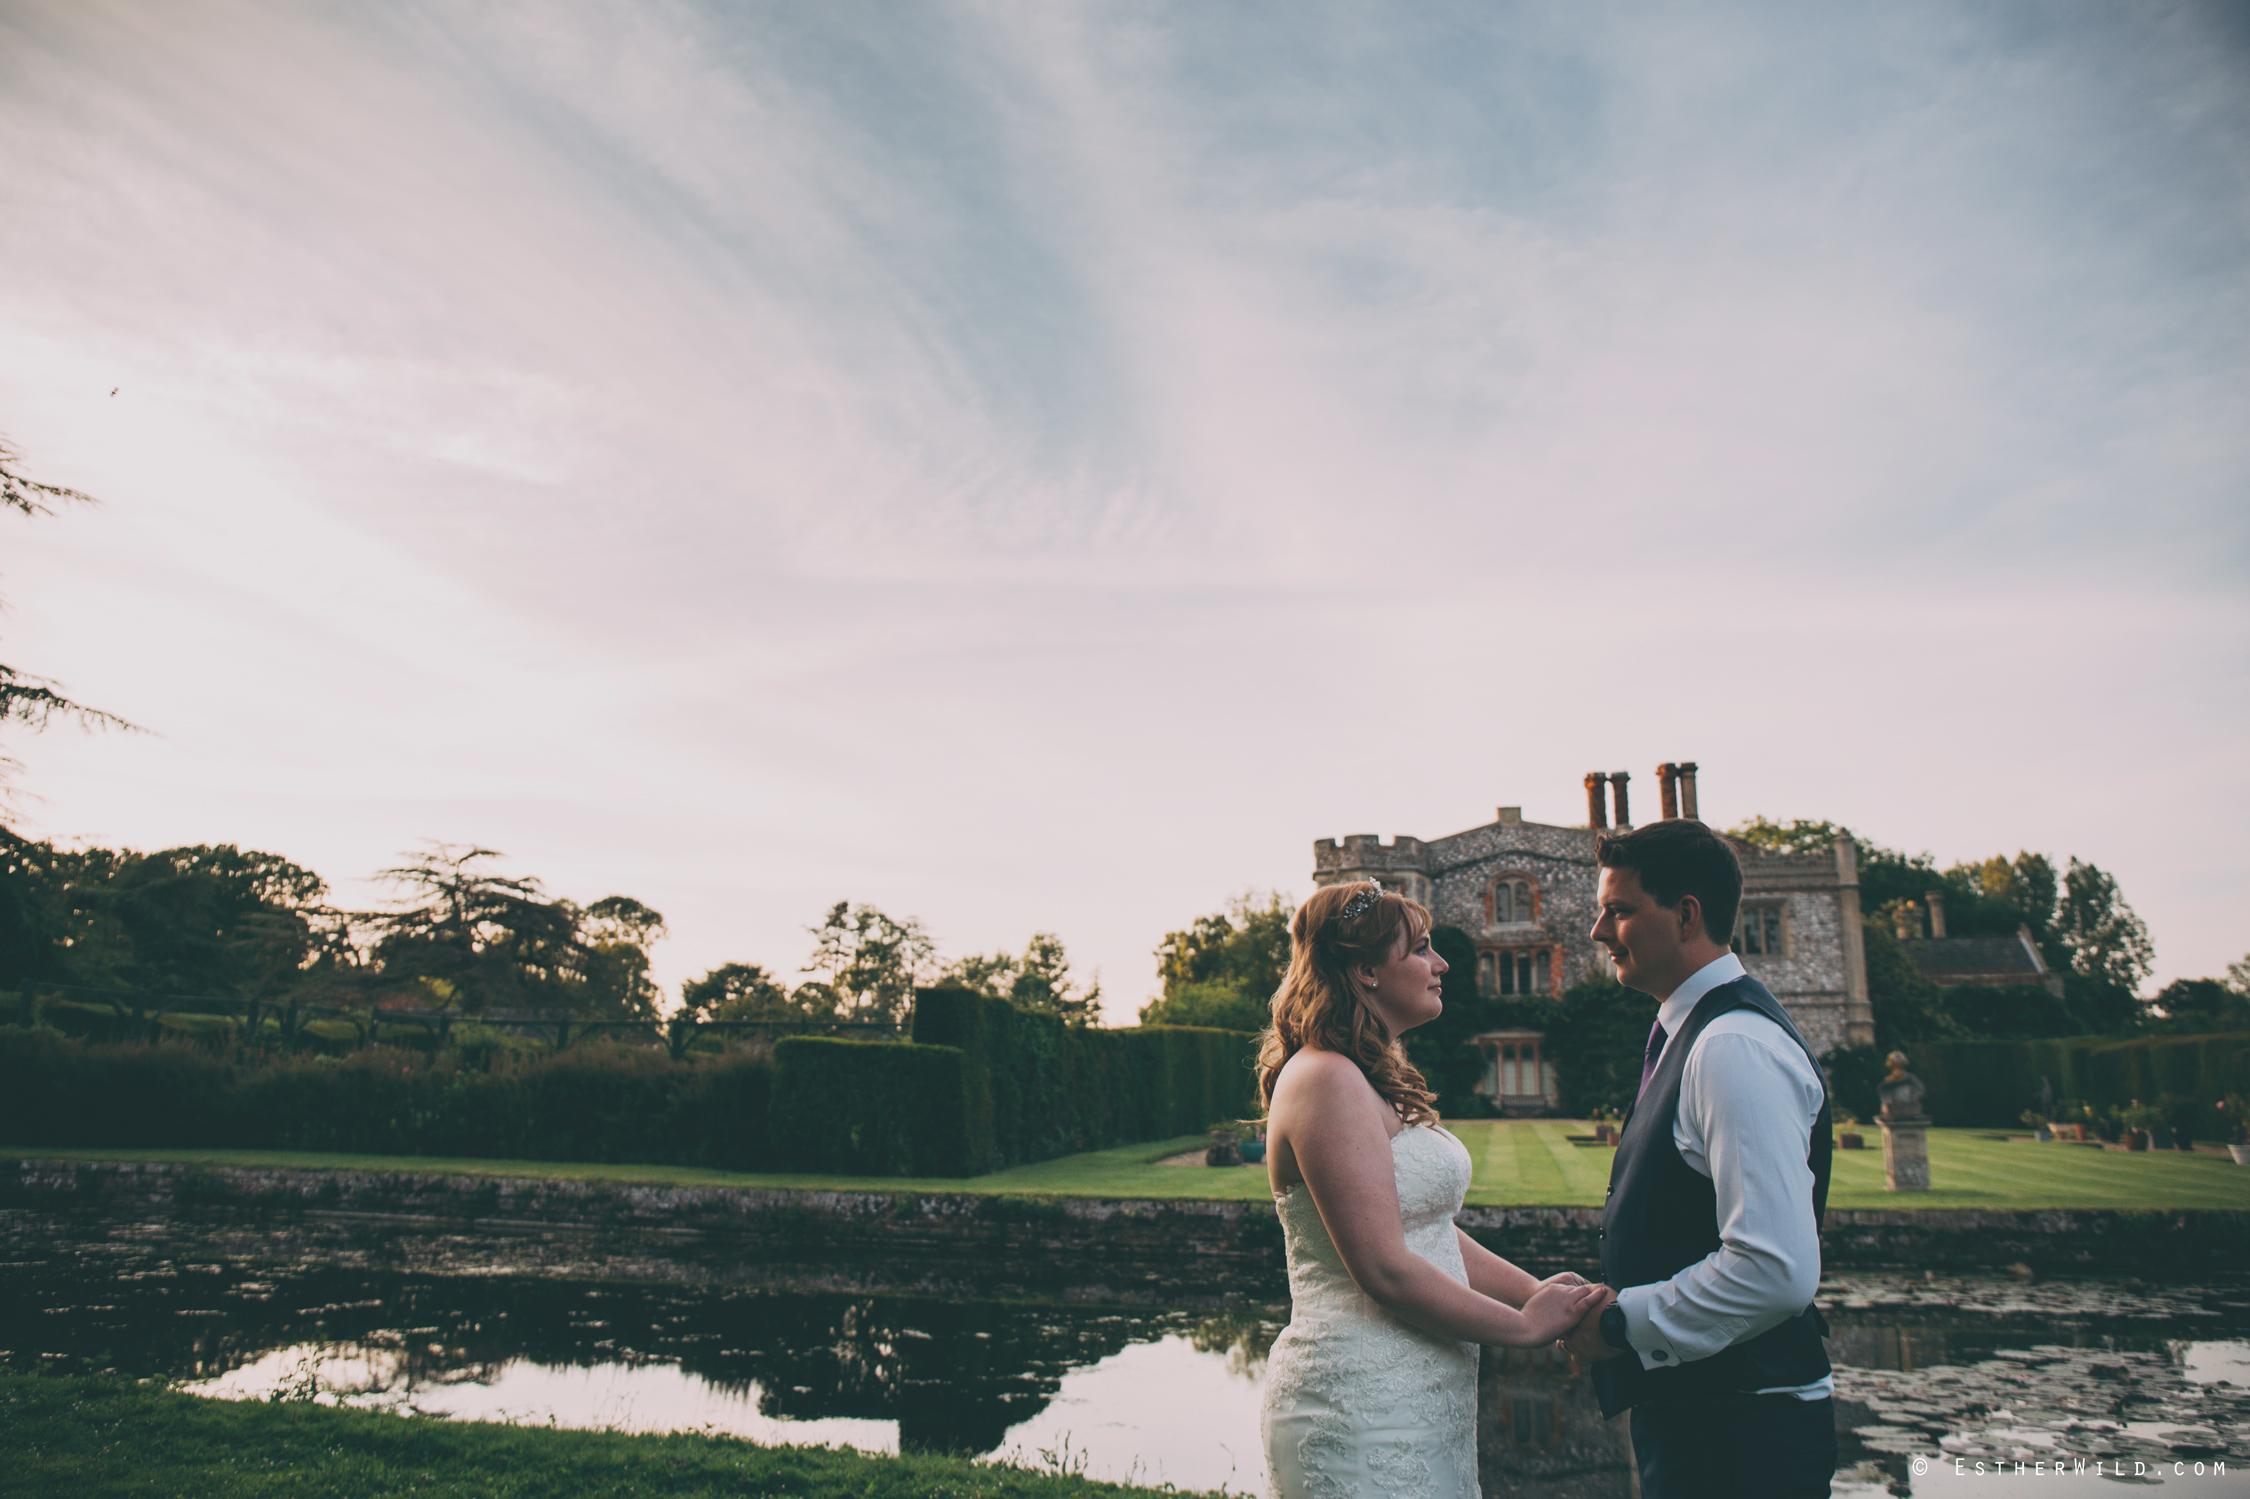 Norfolk_Wedding_Photographer_Mannington_Hall_Country_Esther_Wild_2561.jpg